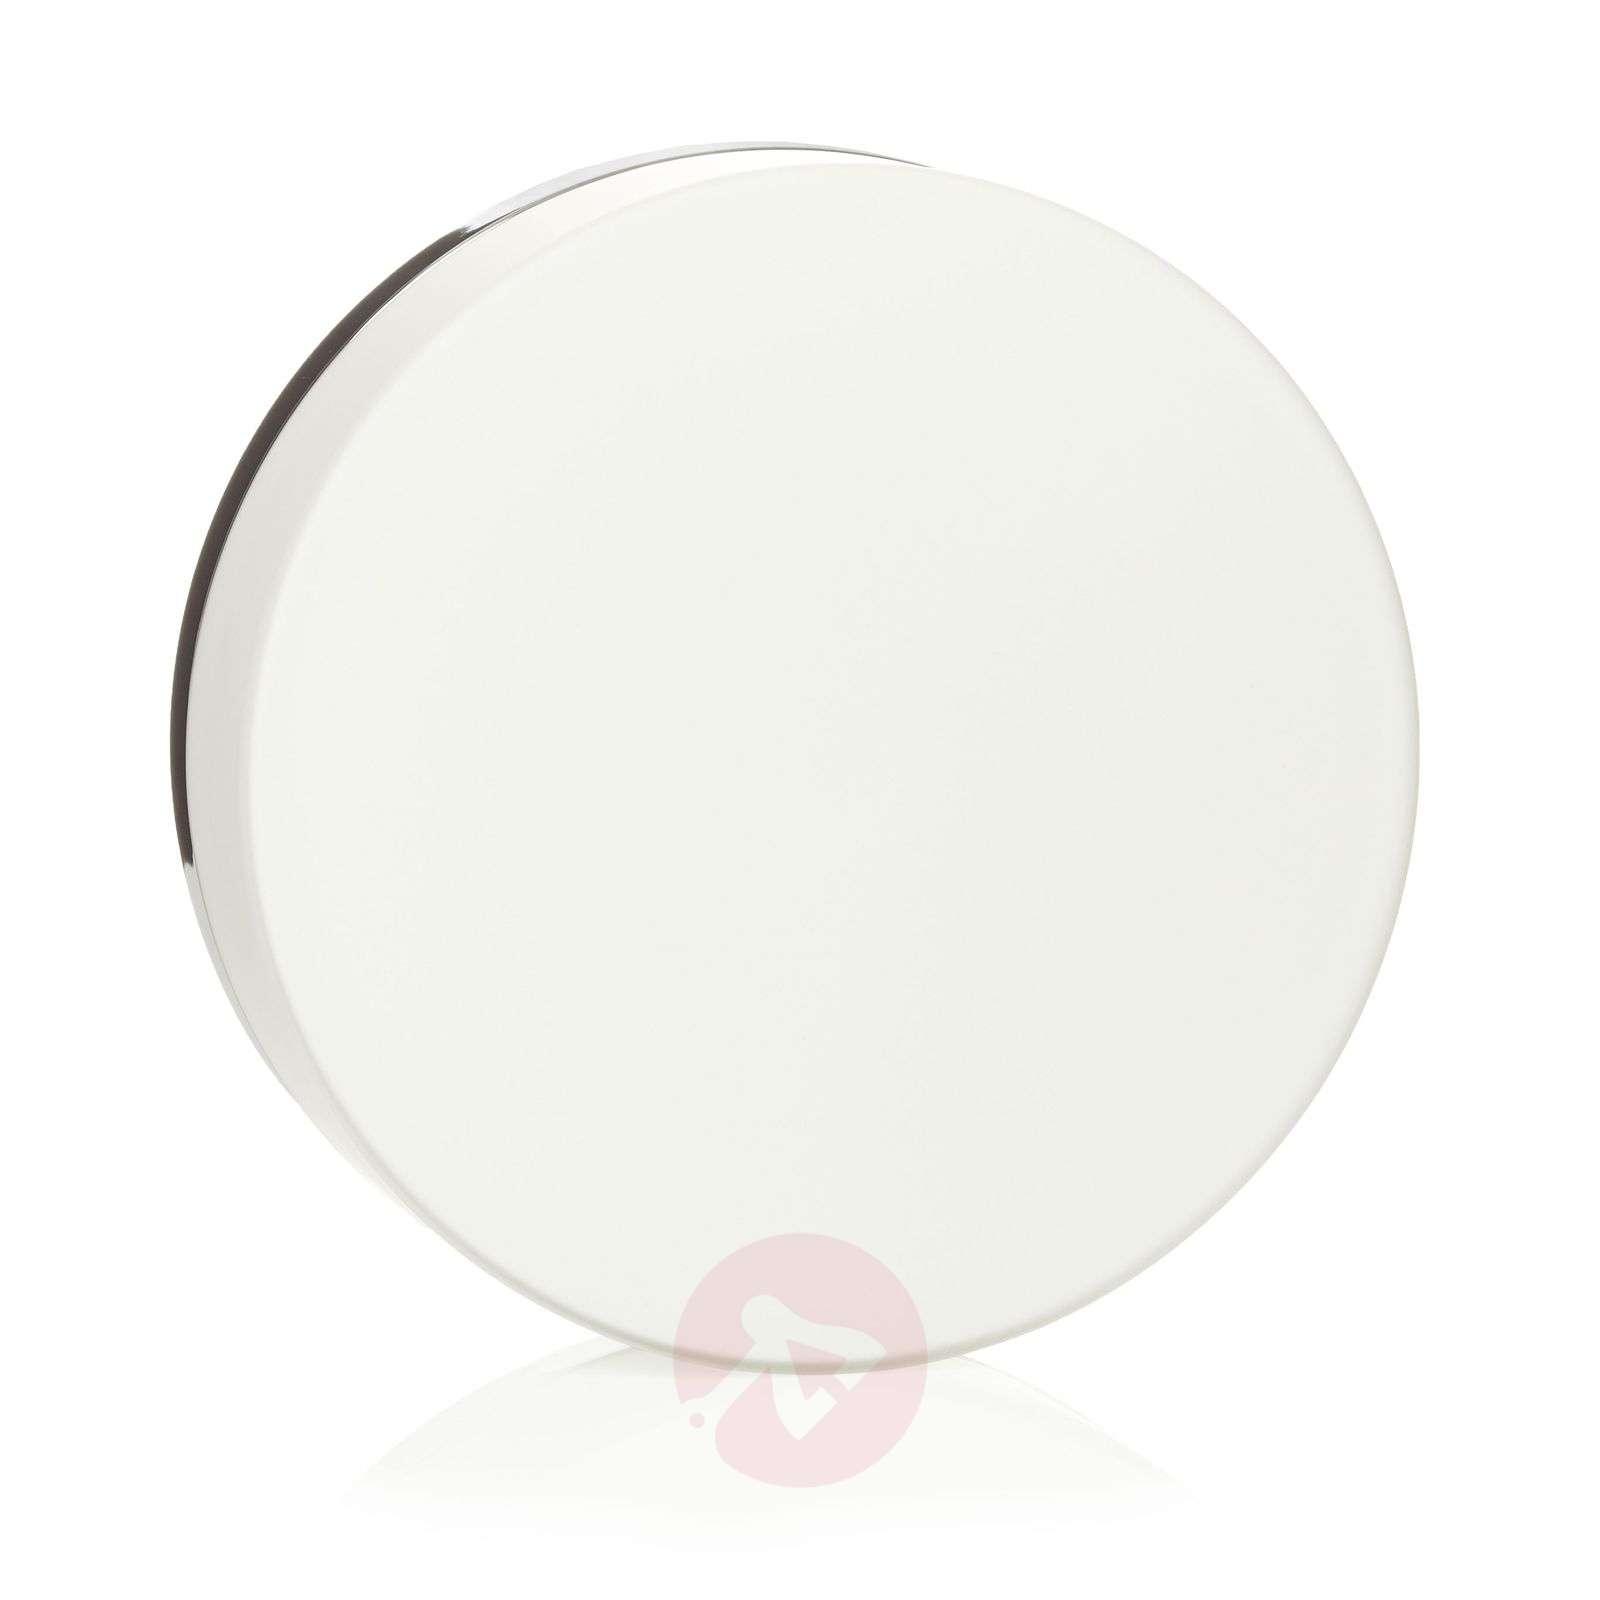 Sabina 280 Bathroom Ceiling Light Round-1020463-02